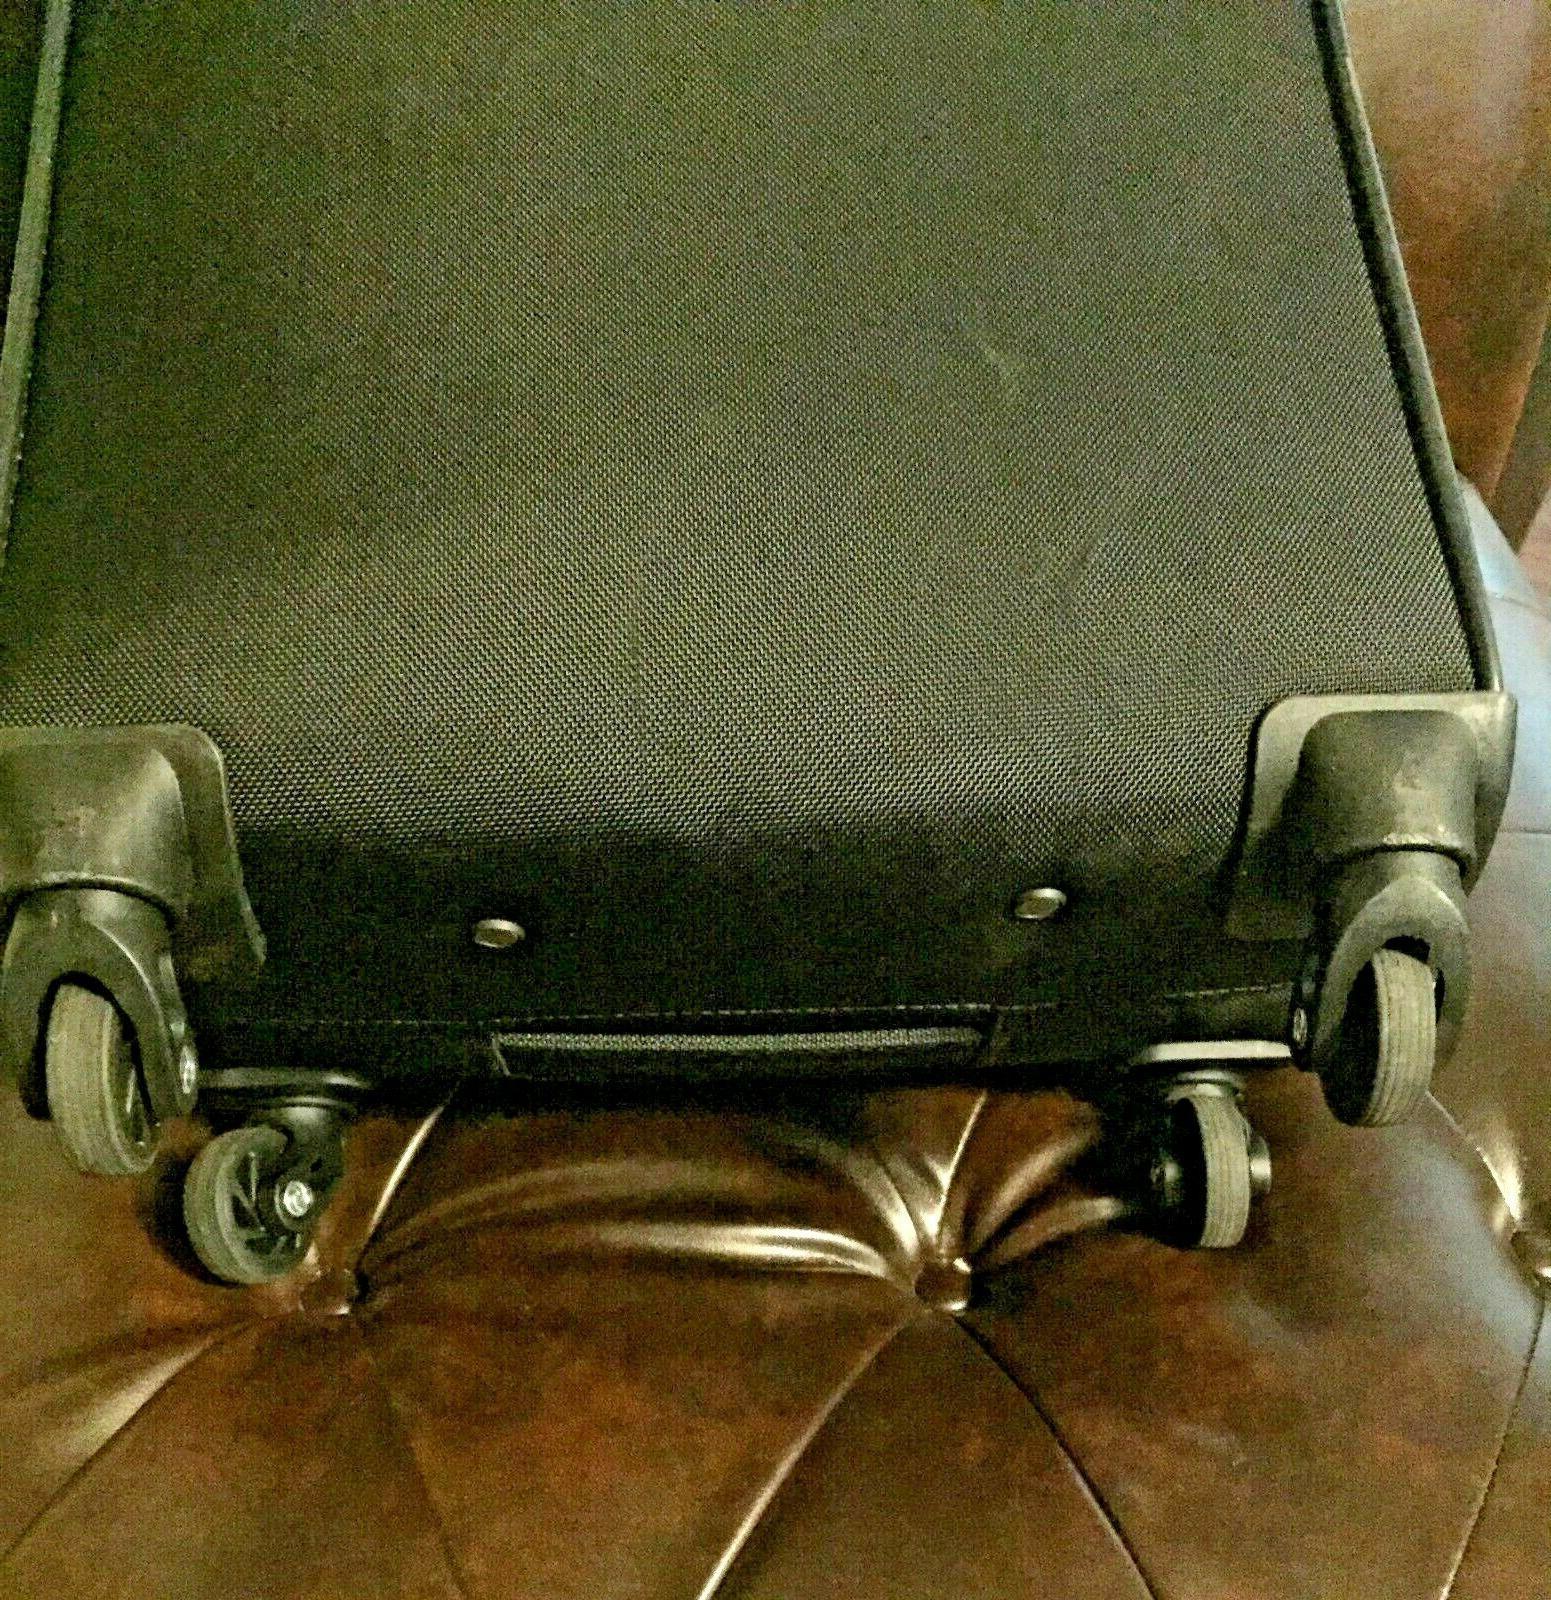 Samsonite Aspire Softside with Spinner Wheels,